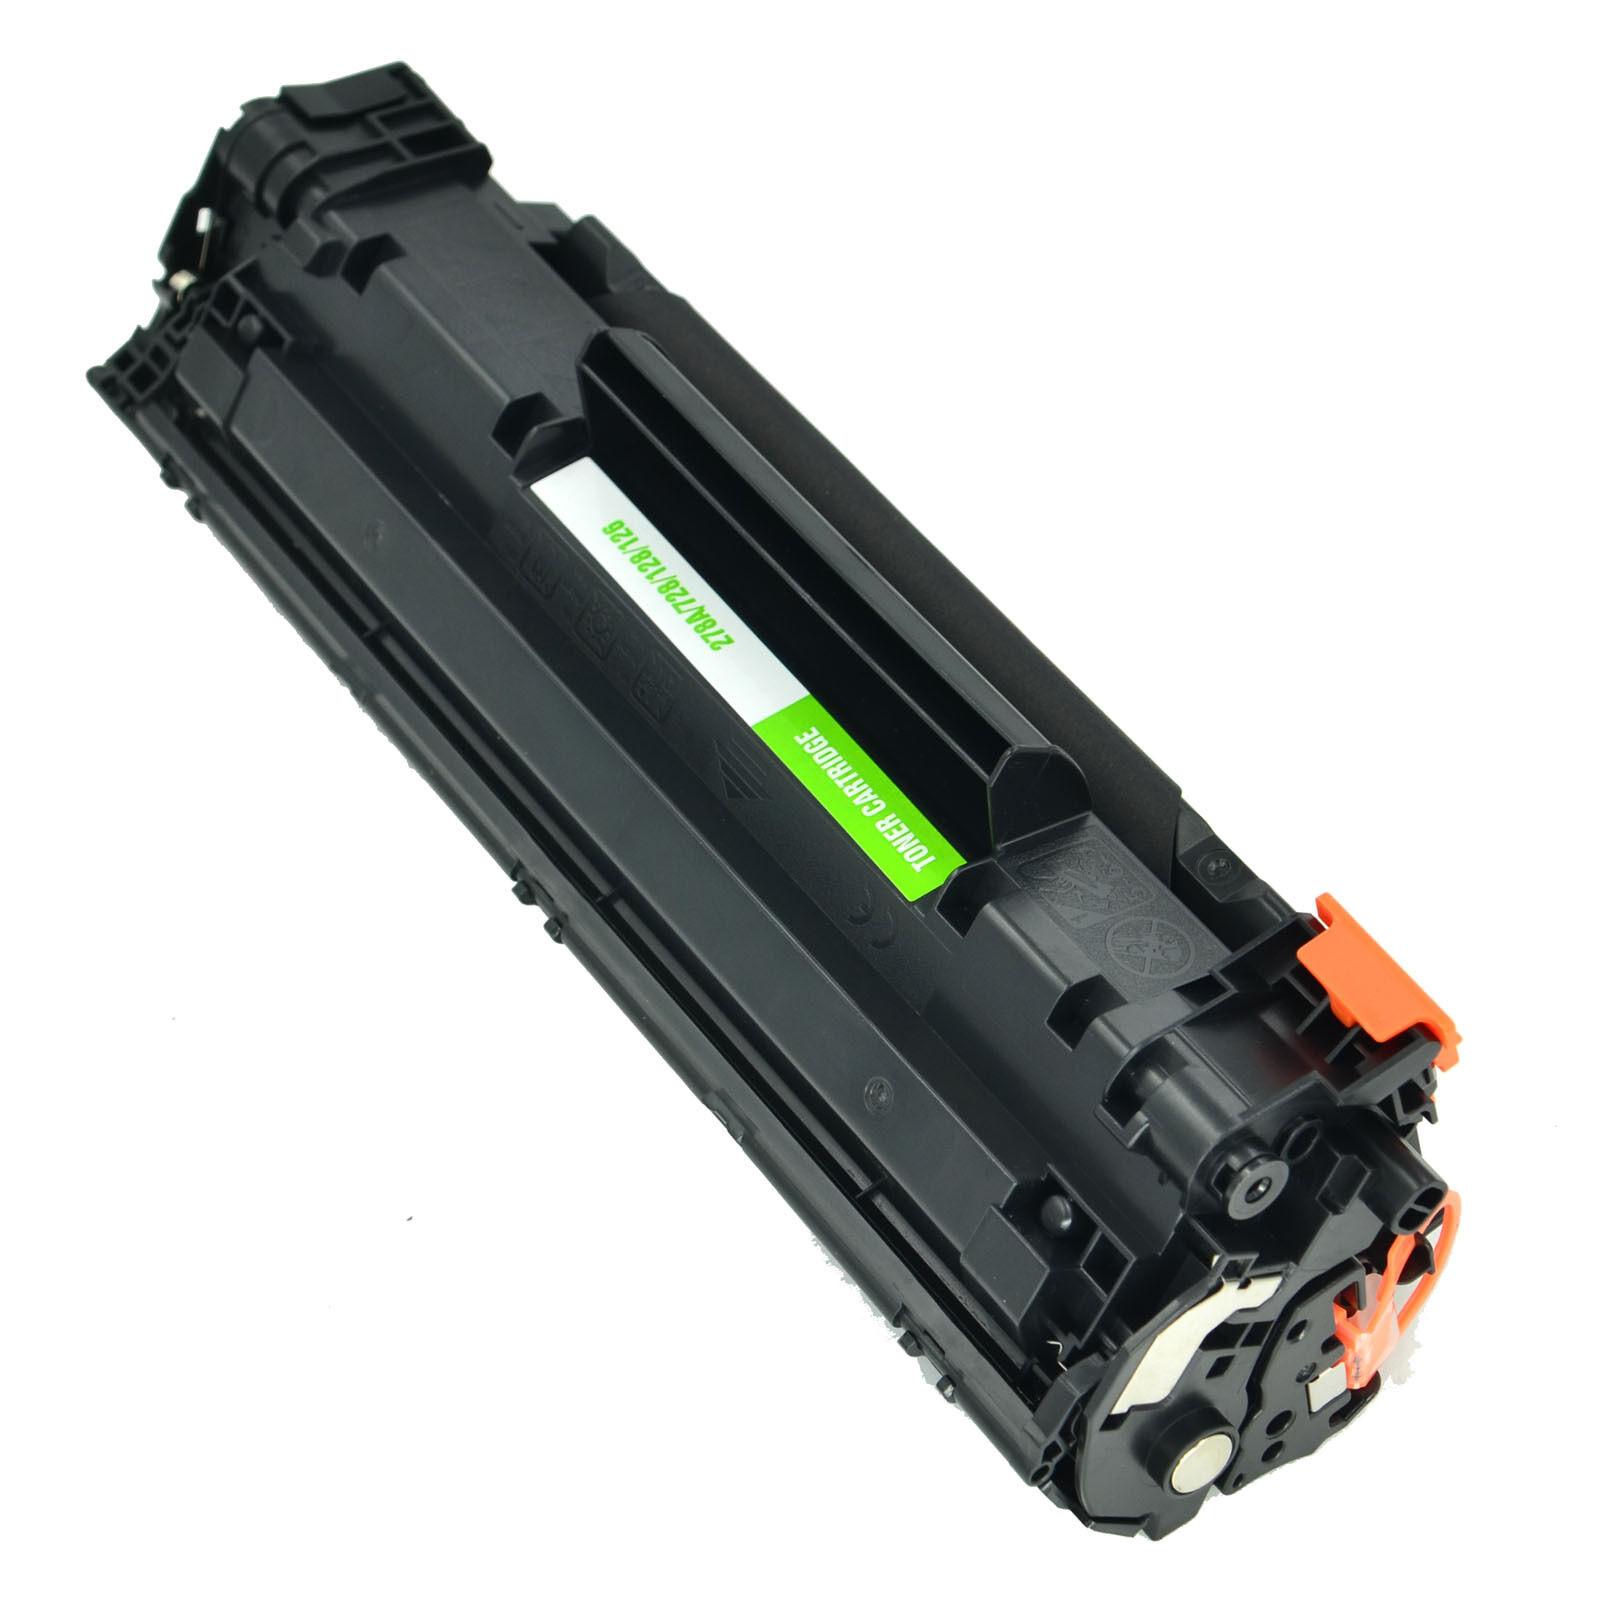 CRG128 Black Toner Cartridge for Canon 128 ImageClass D530 D550 MF4412 4450 4570